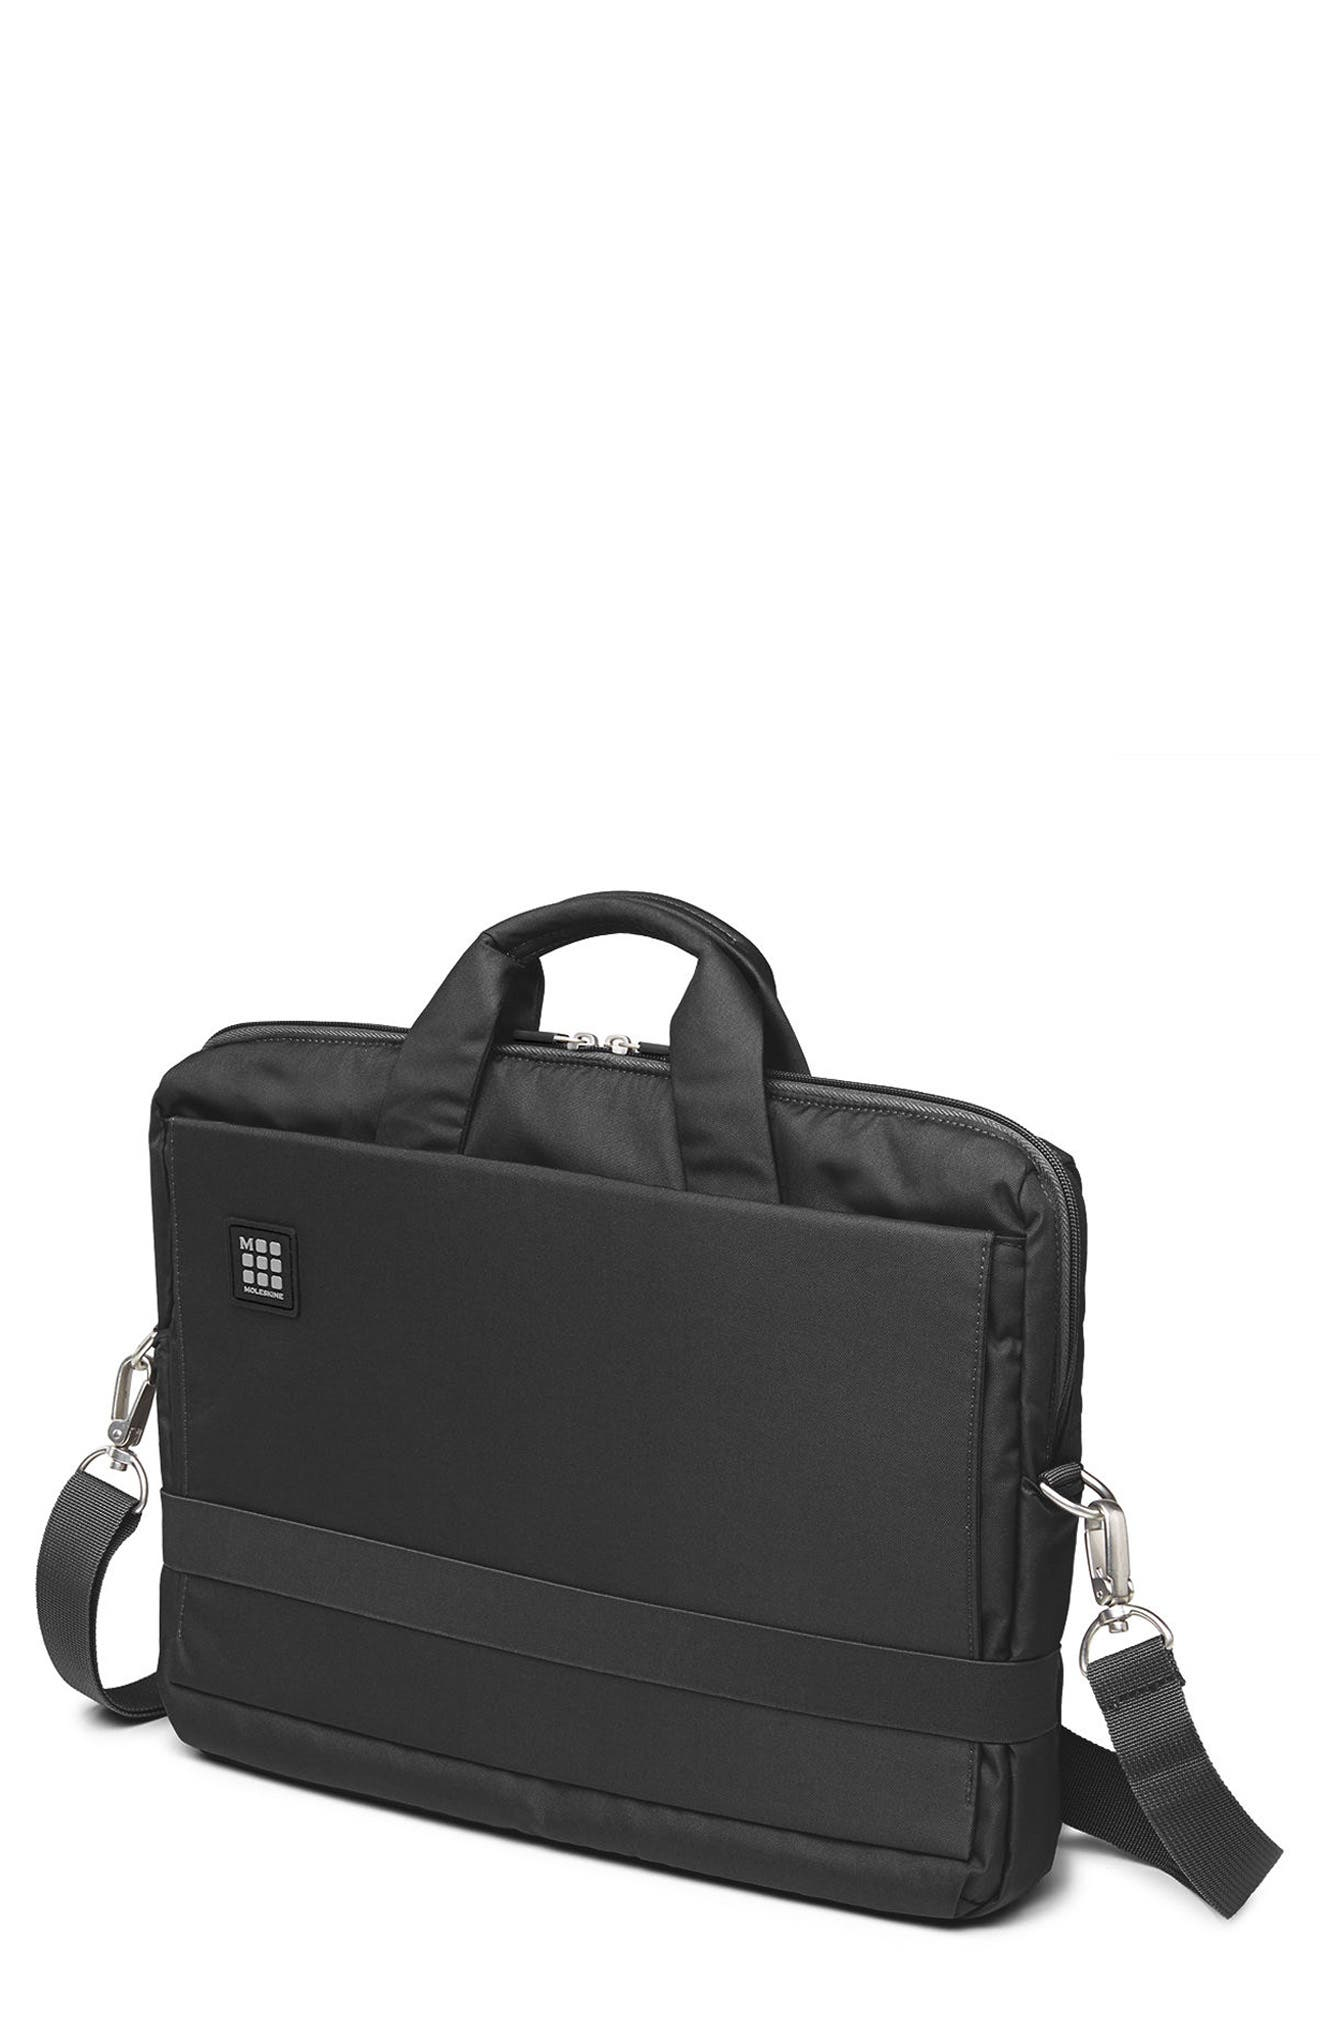 Moleskine Horizontal Device Bag